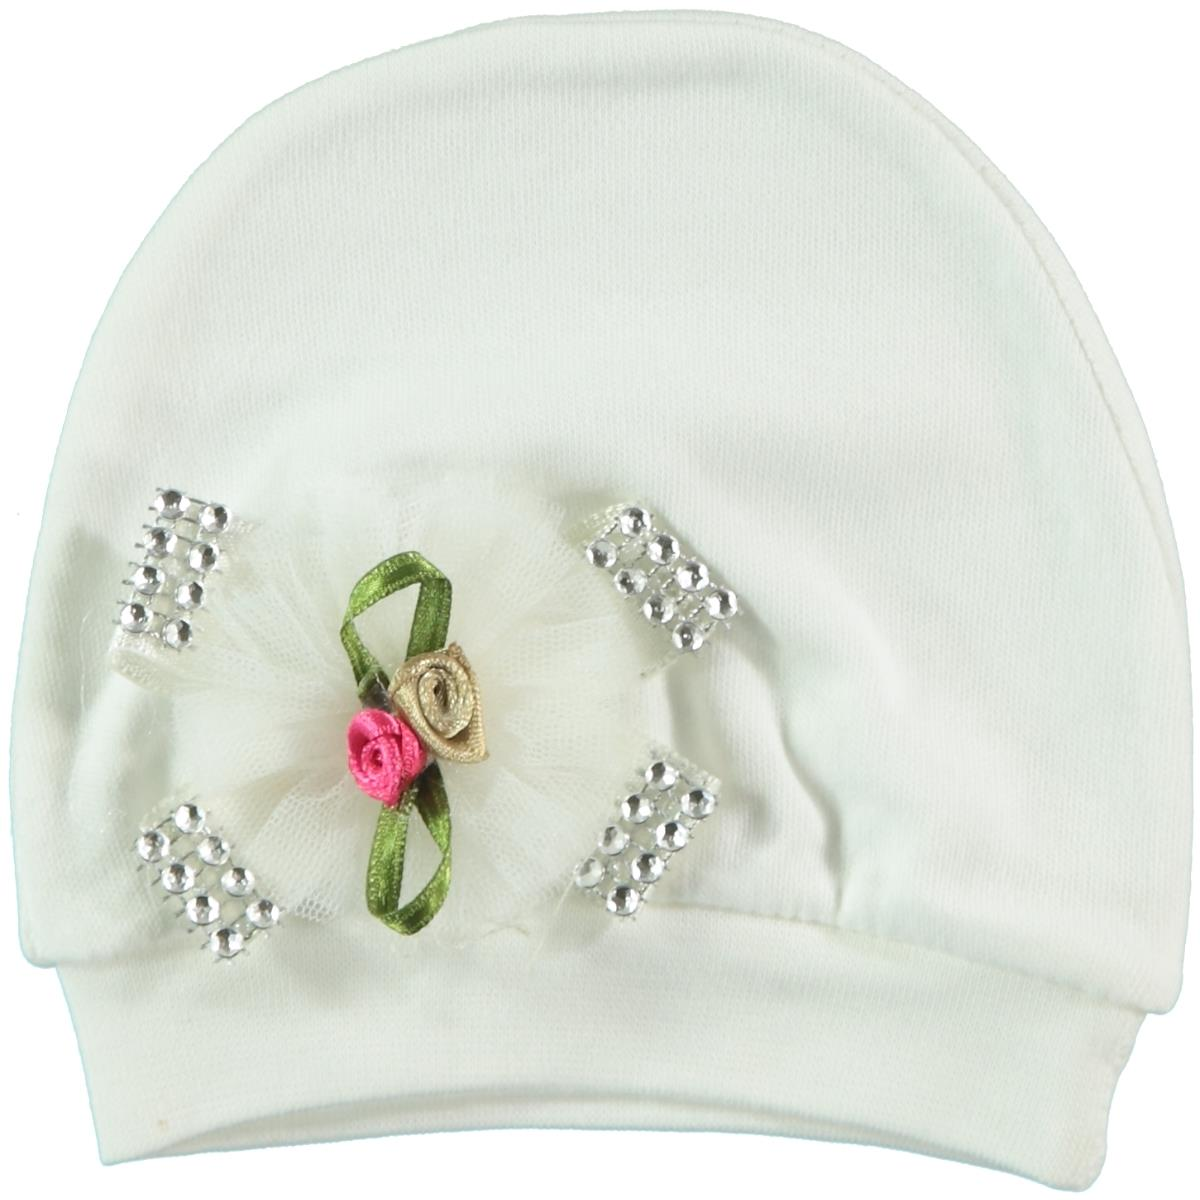 T.F.Taffy Ecru 0-3 Months Baby Girl Accessories Hat